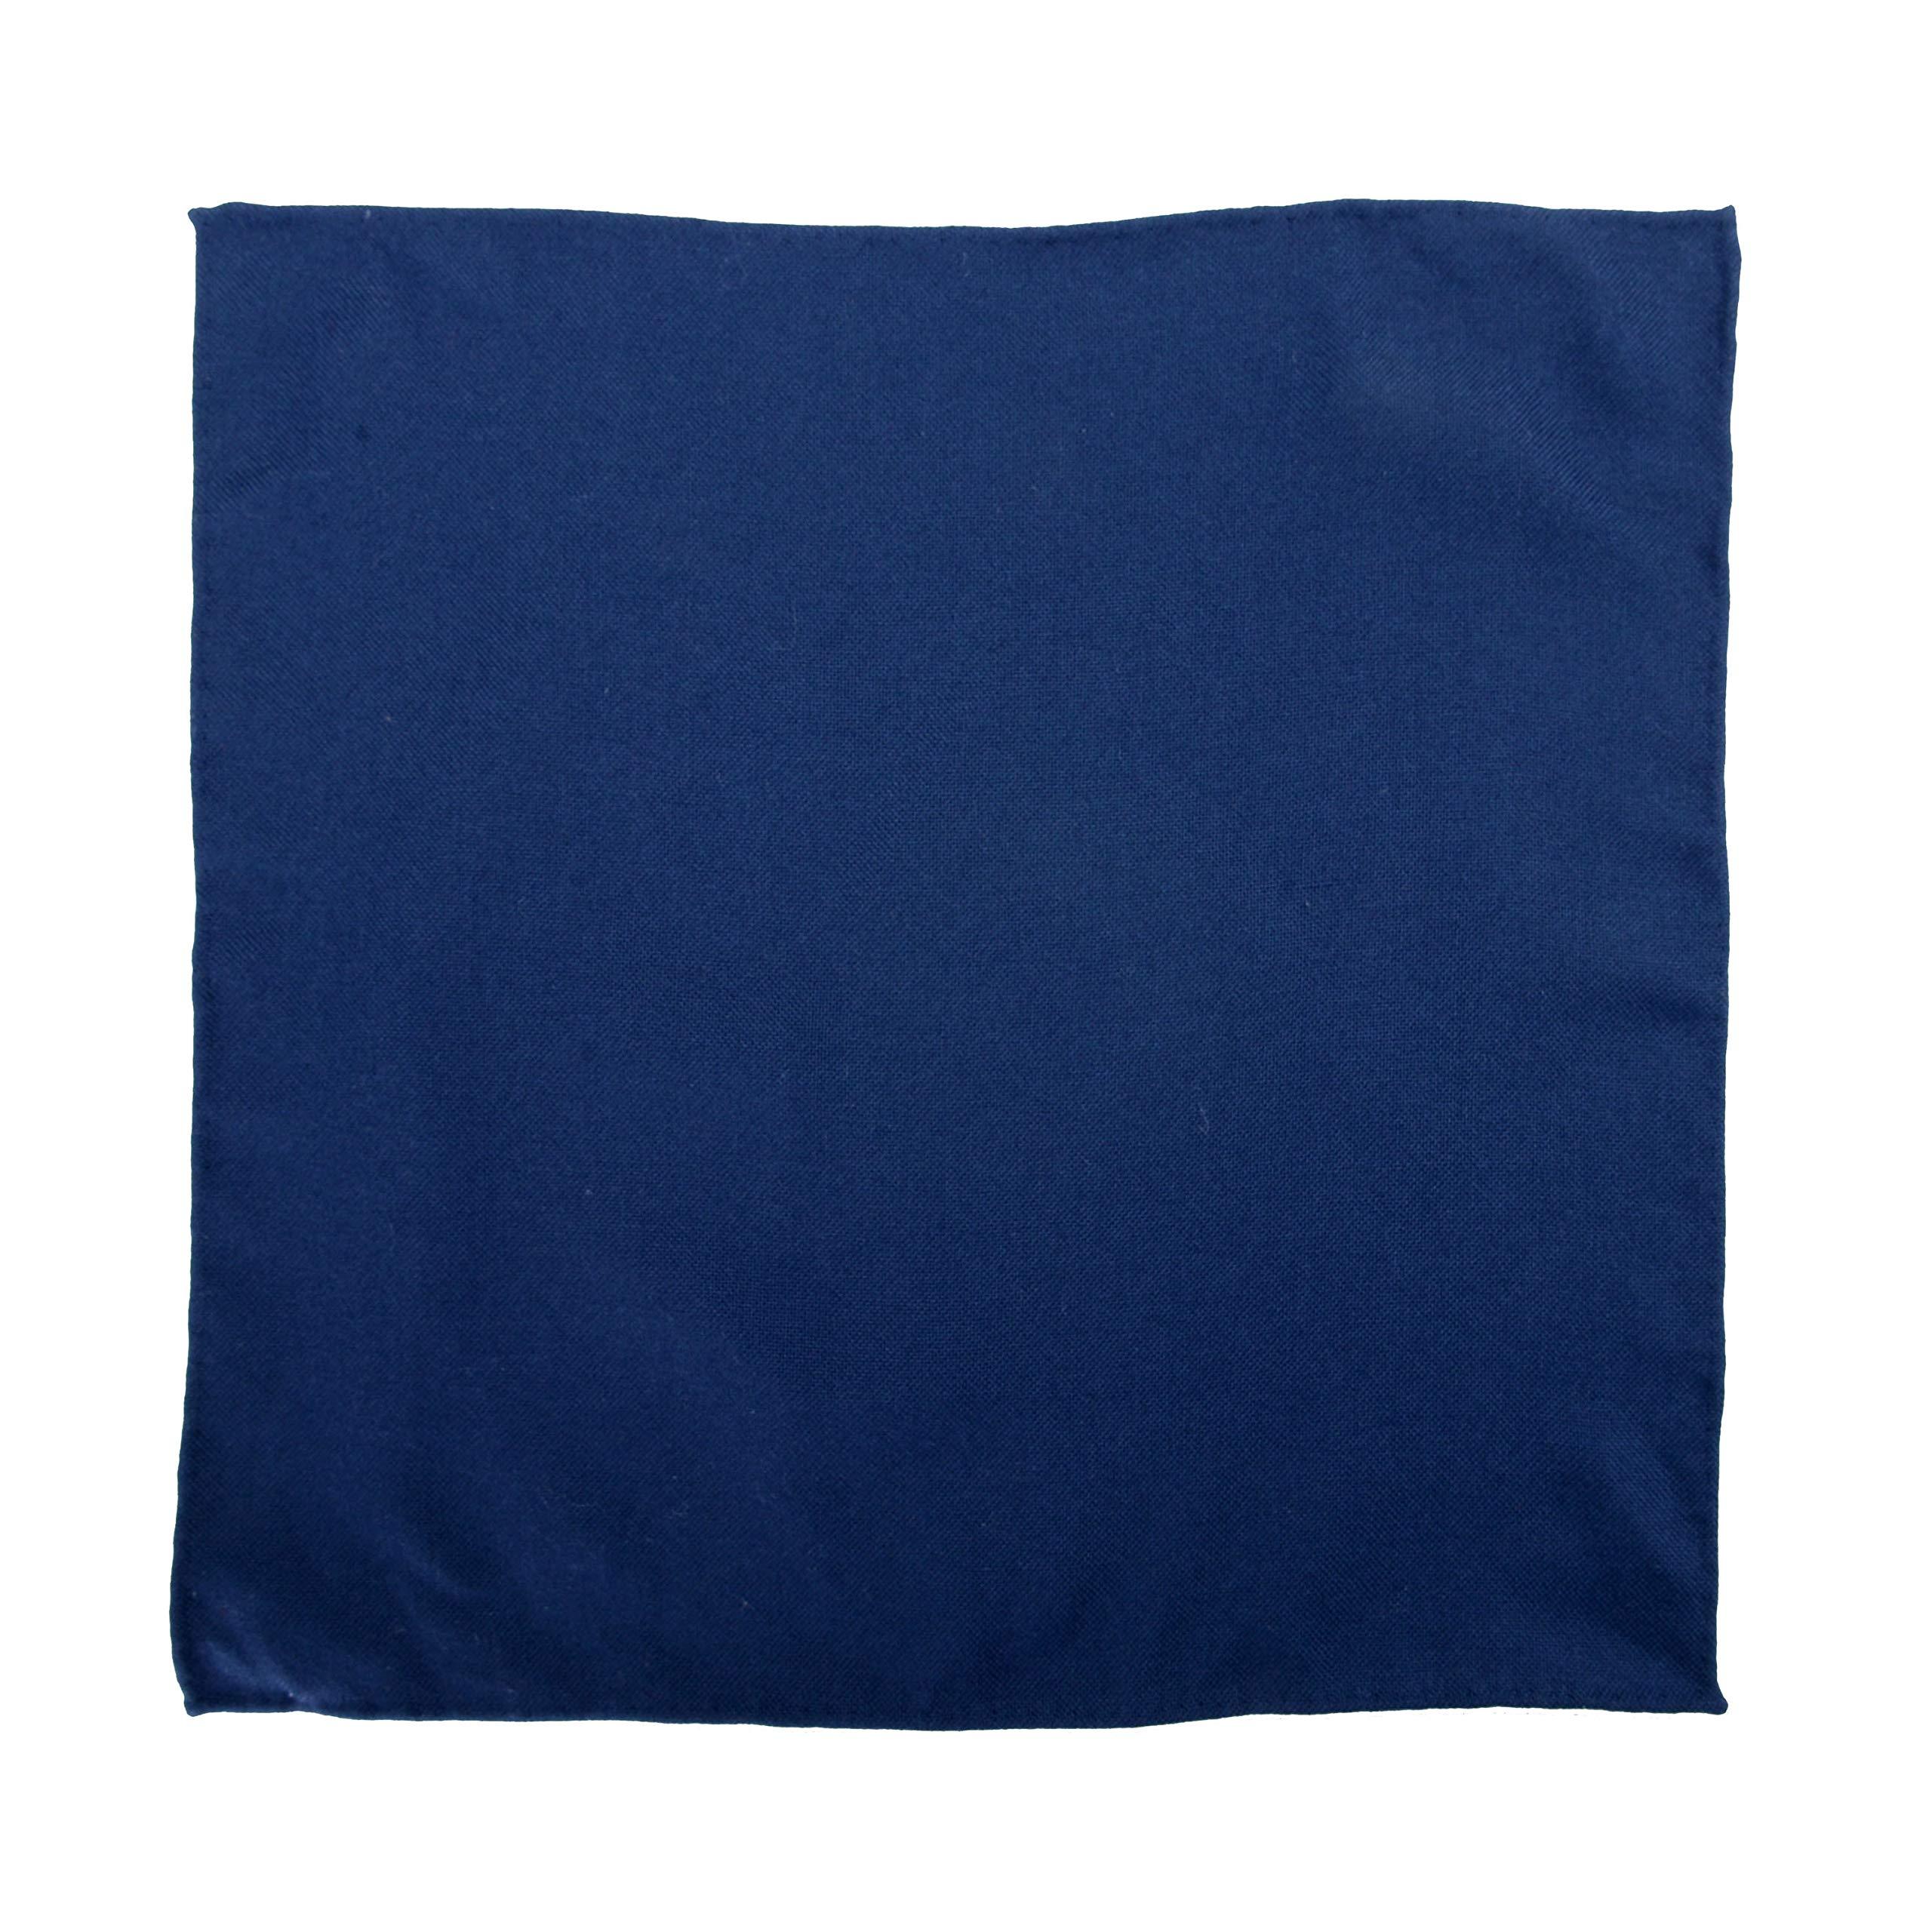 Malo Men's 100% Cashmere Blue Pocket Square